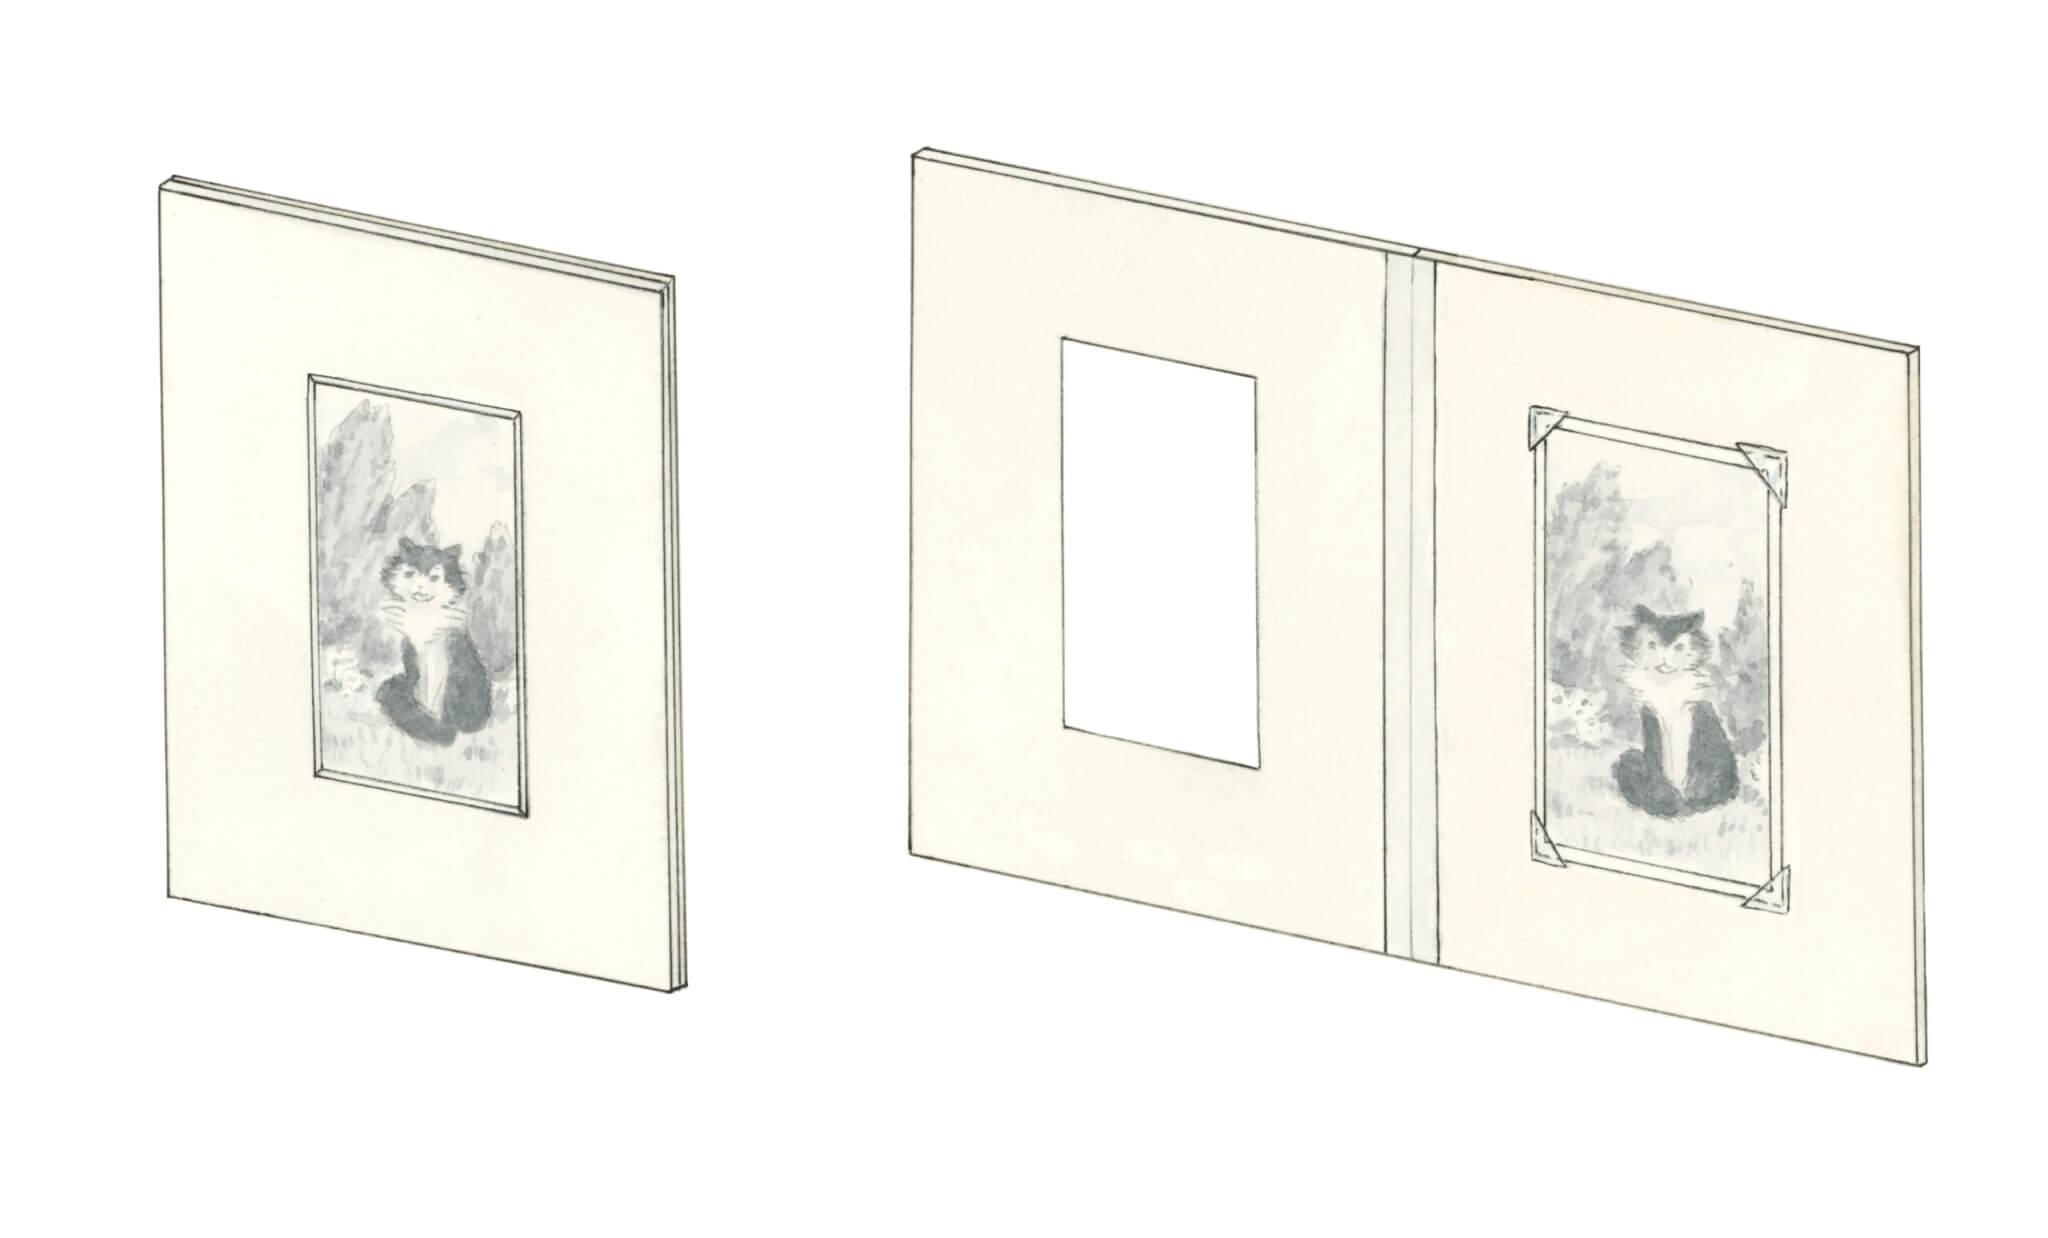 Book mat, archival housing for photographs, archival housing for fine art, archival housing for fine prints